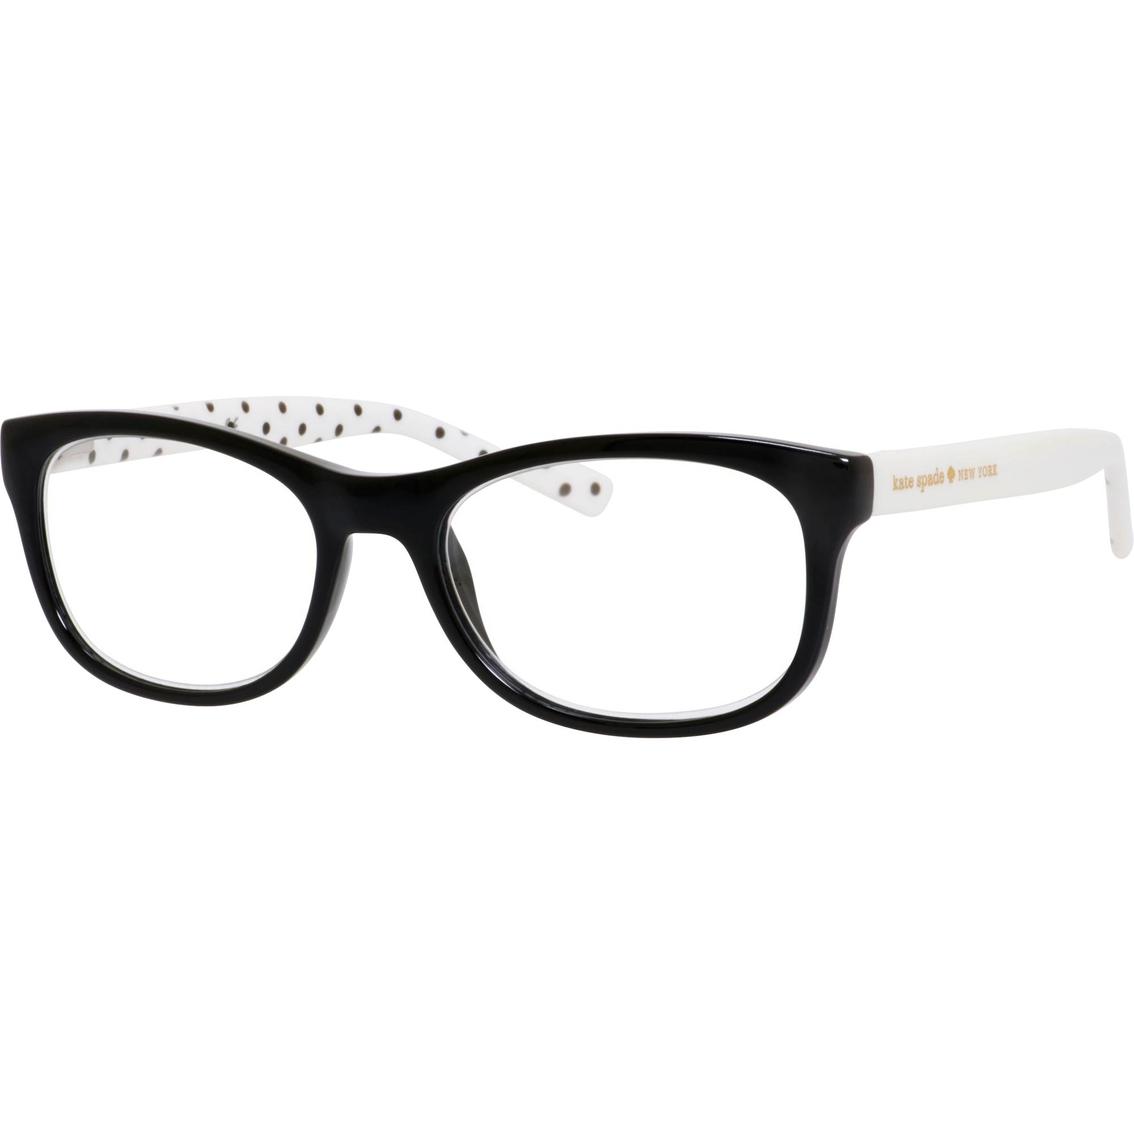 29dcd42a4293 Kate Spade Lettie Reading Glasses | Readers | Beauty & Health | Shop ...